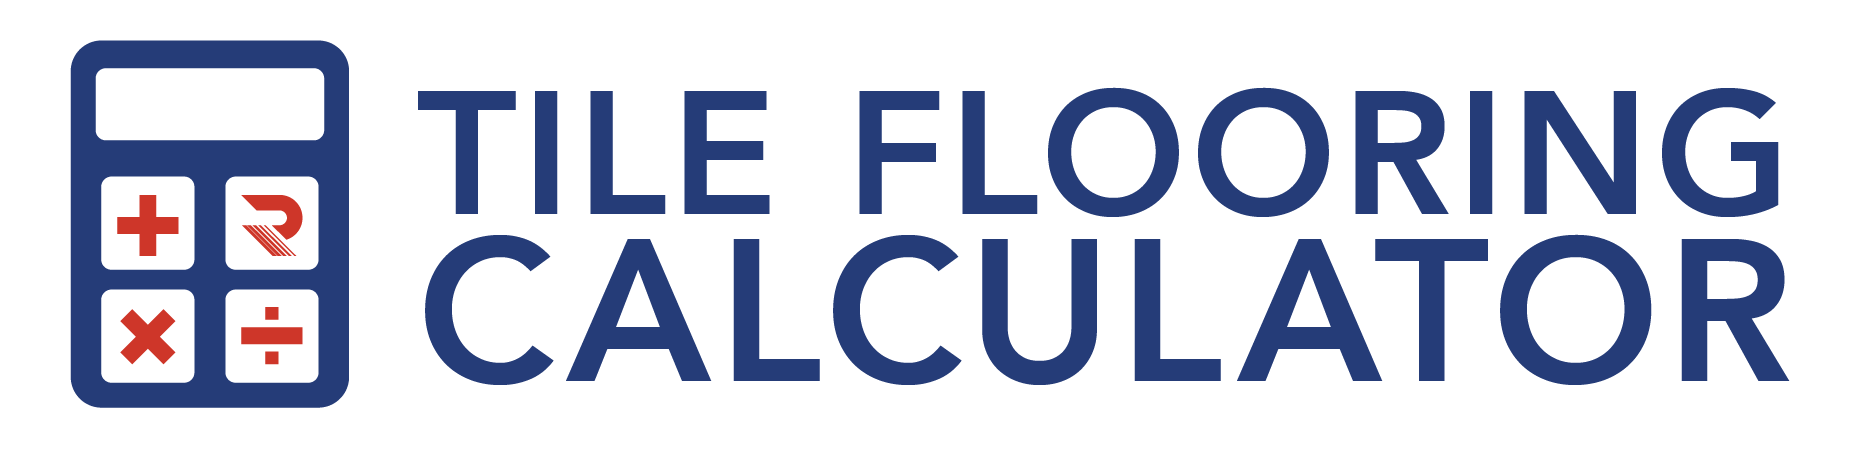 Tile Flooring Calculator